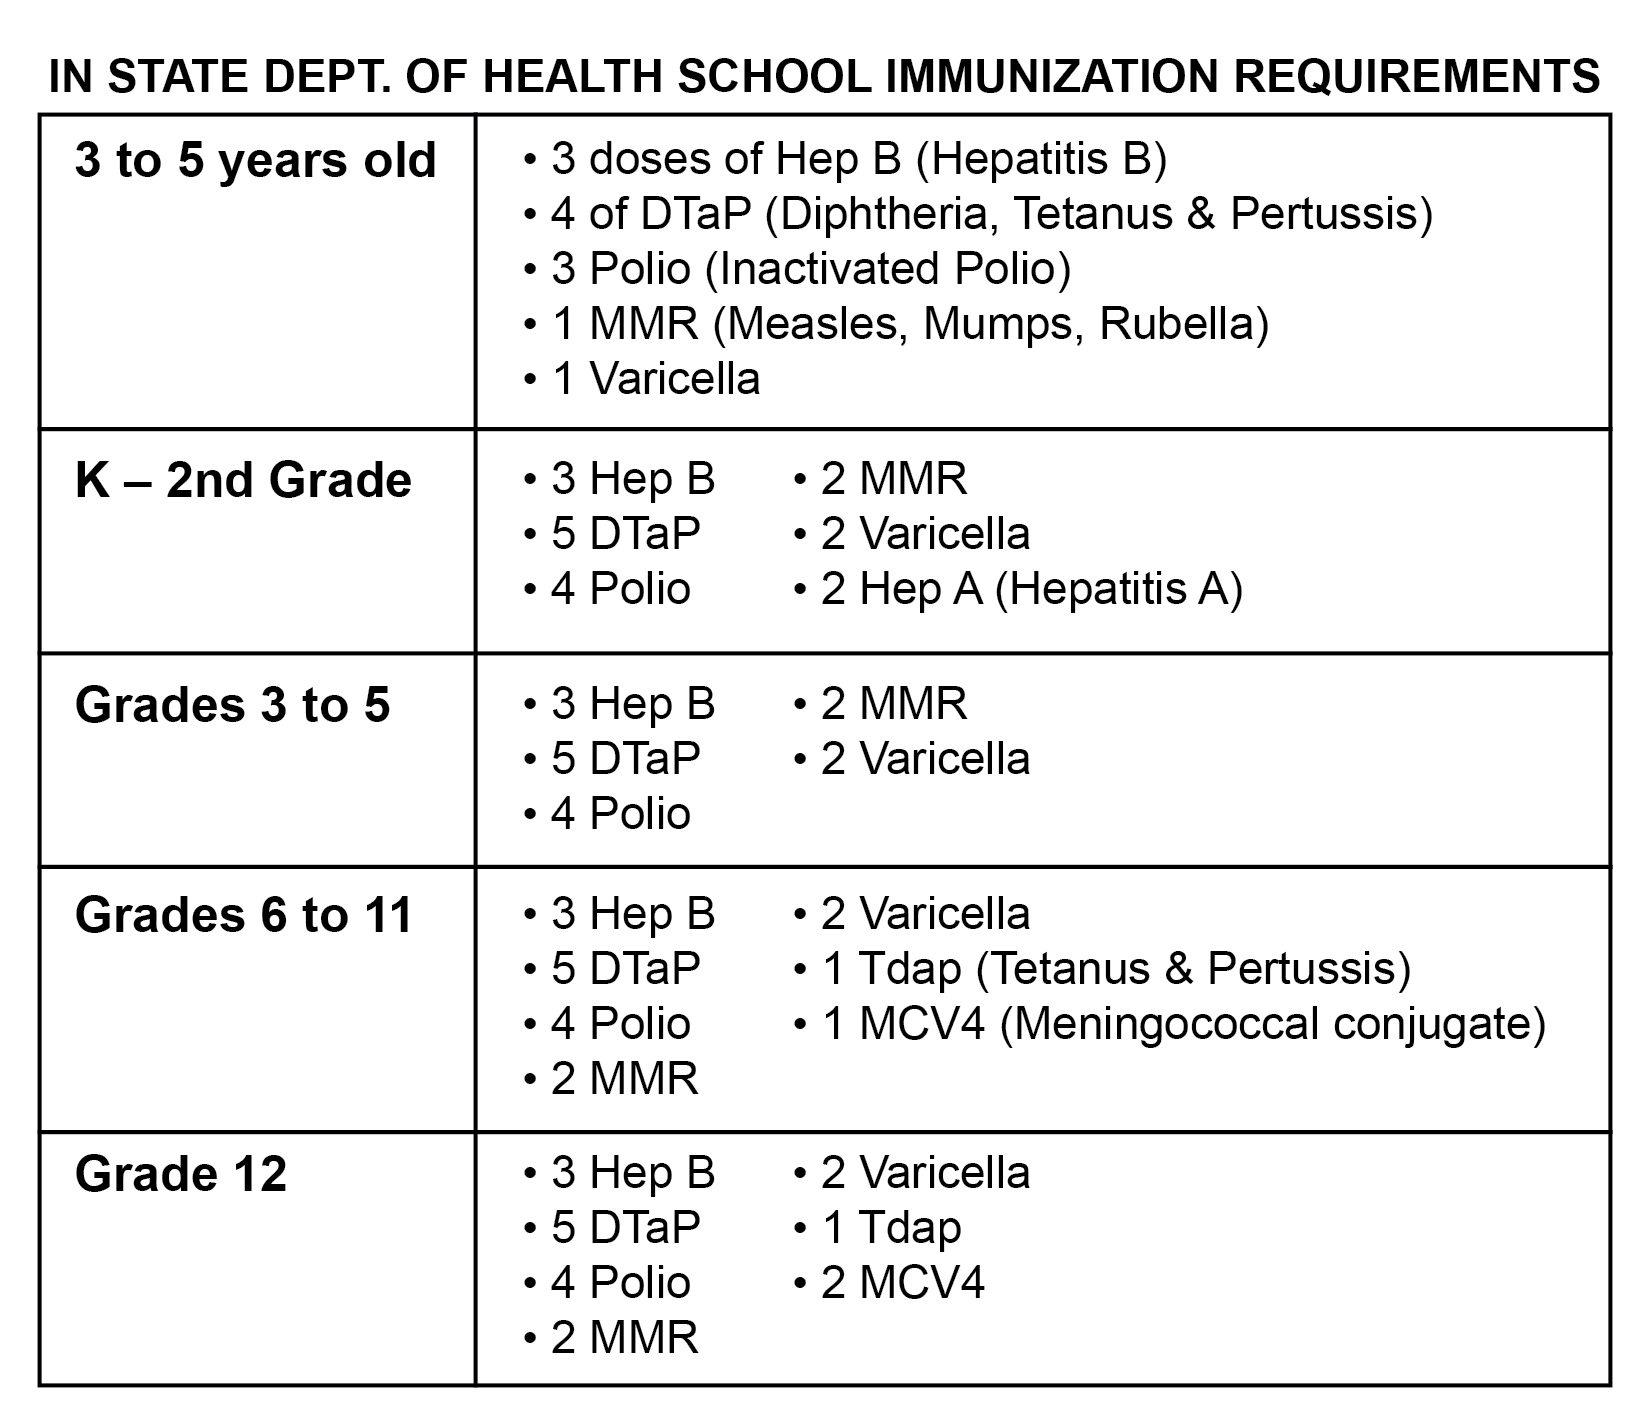 Indiana immunization recommendations